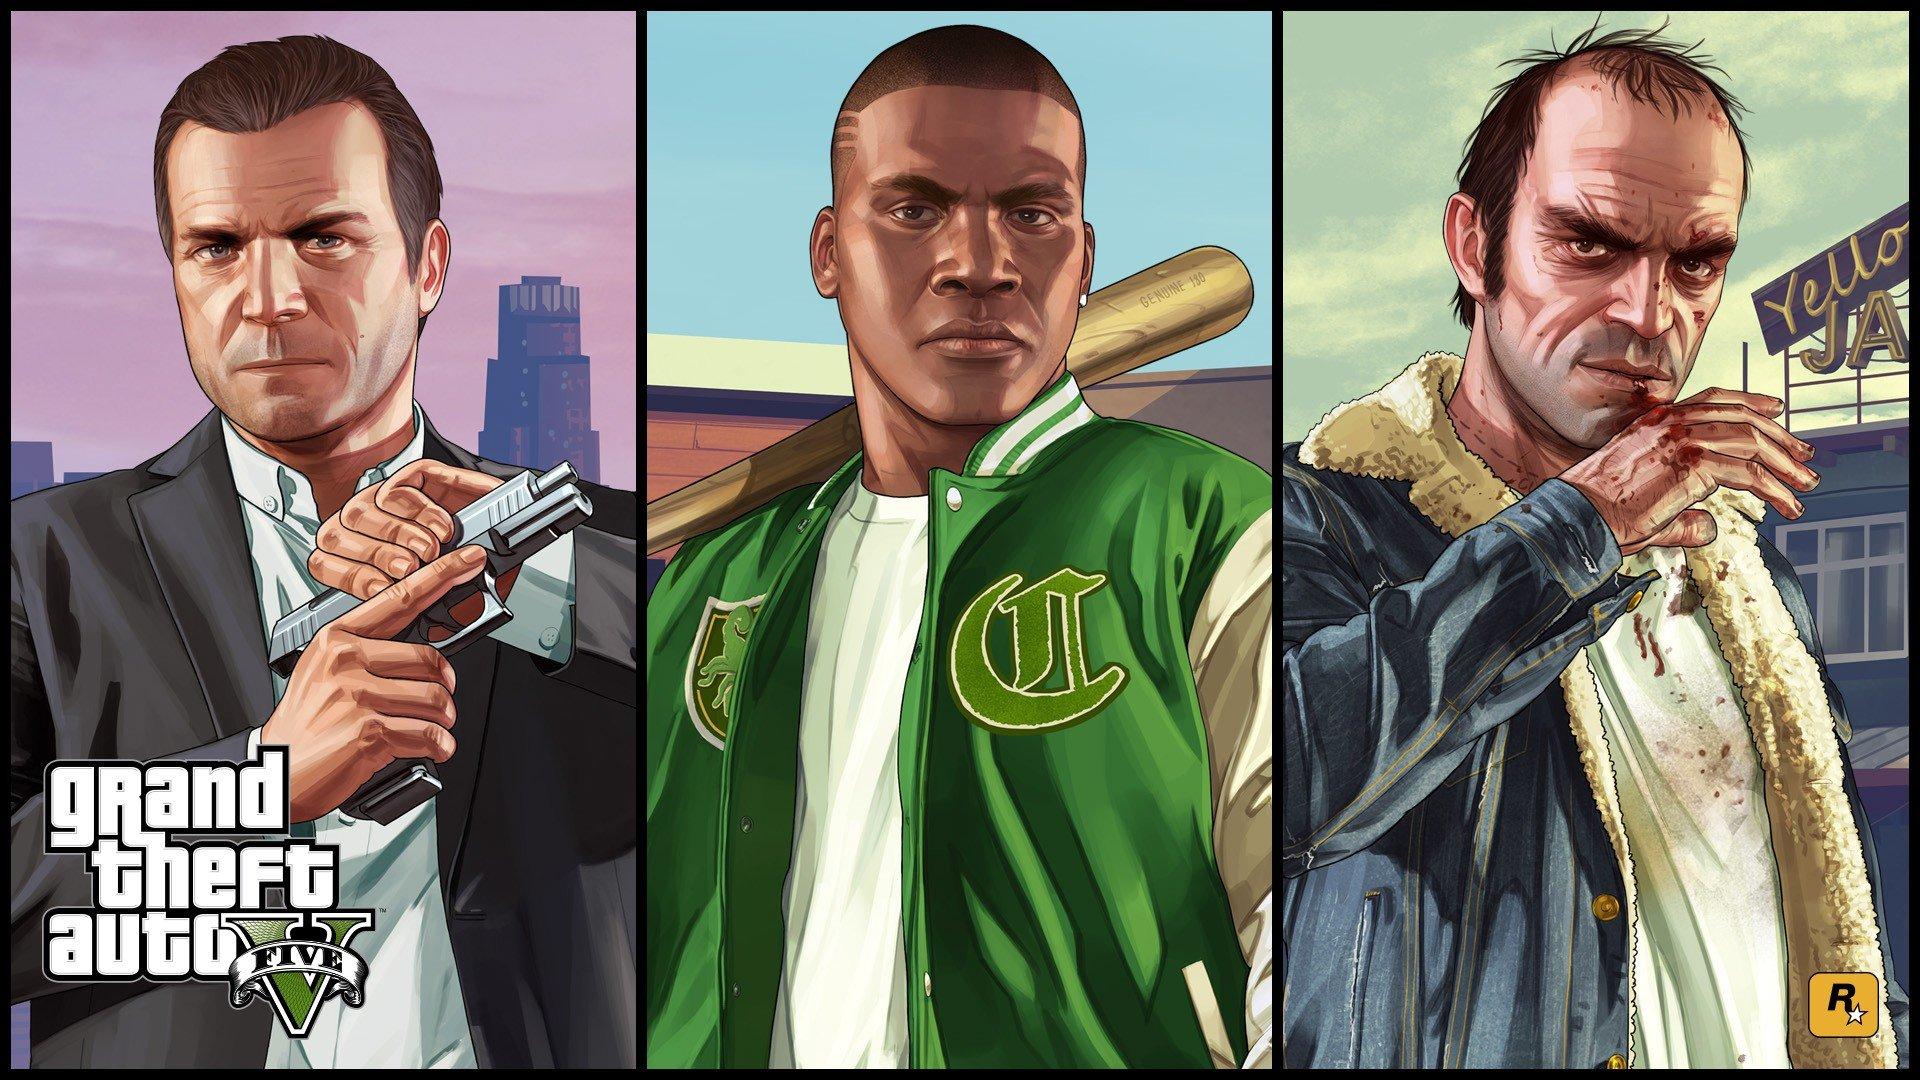 Trevor Philips, Franklin Clinton, Michael De Santa, Video games, Grand Theft Auto V, Grand Theft Auto Wallpaper